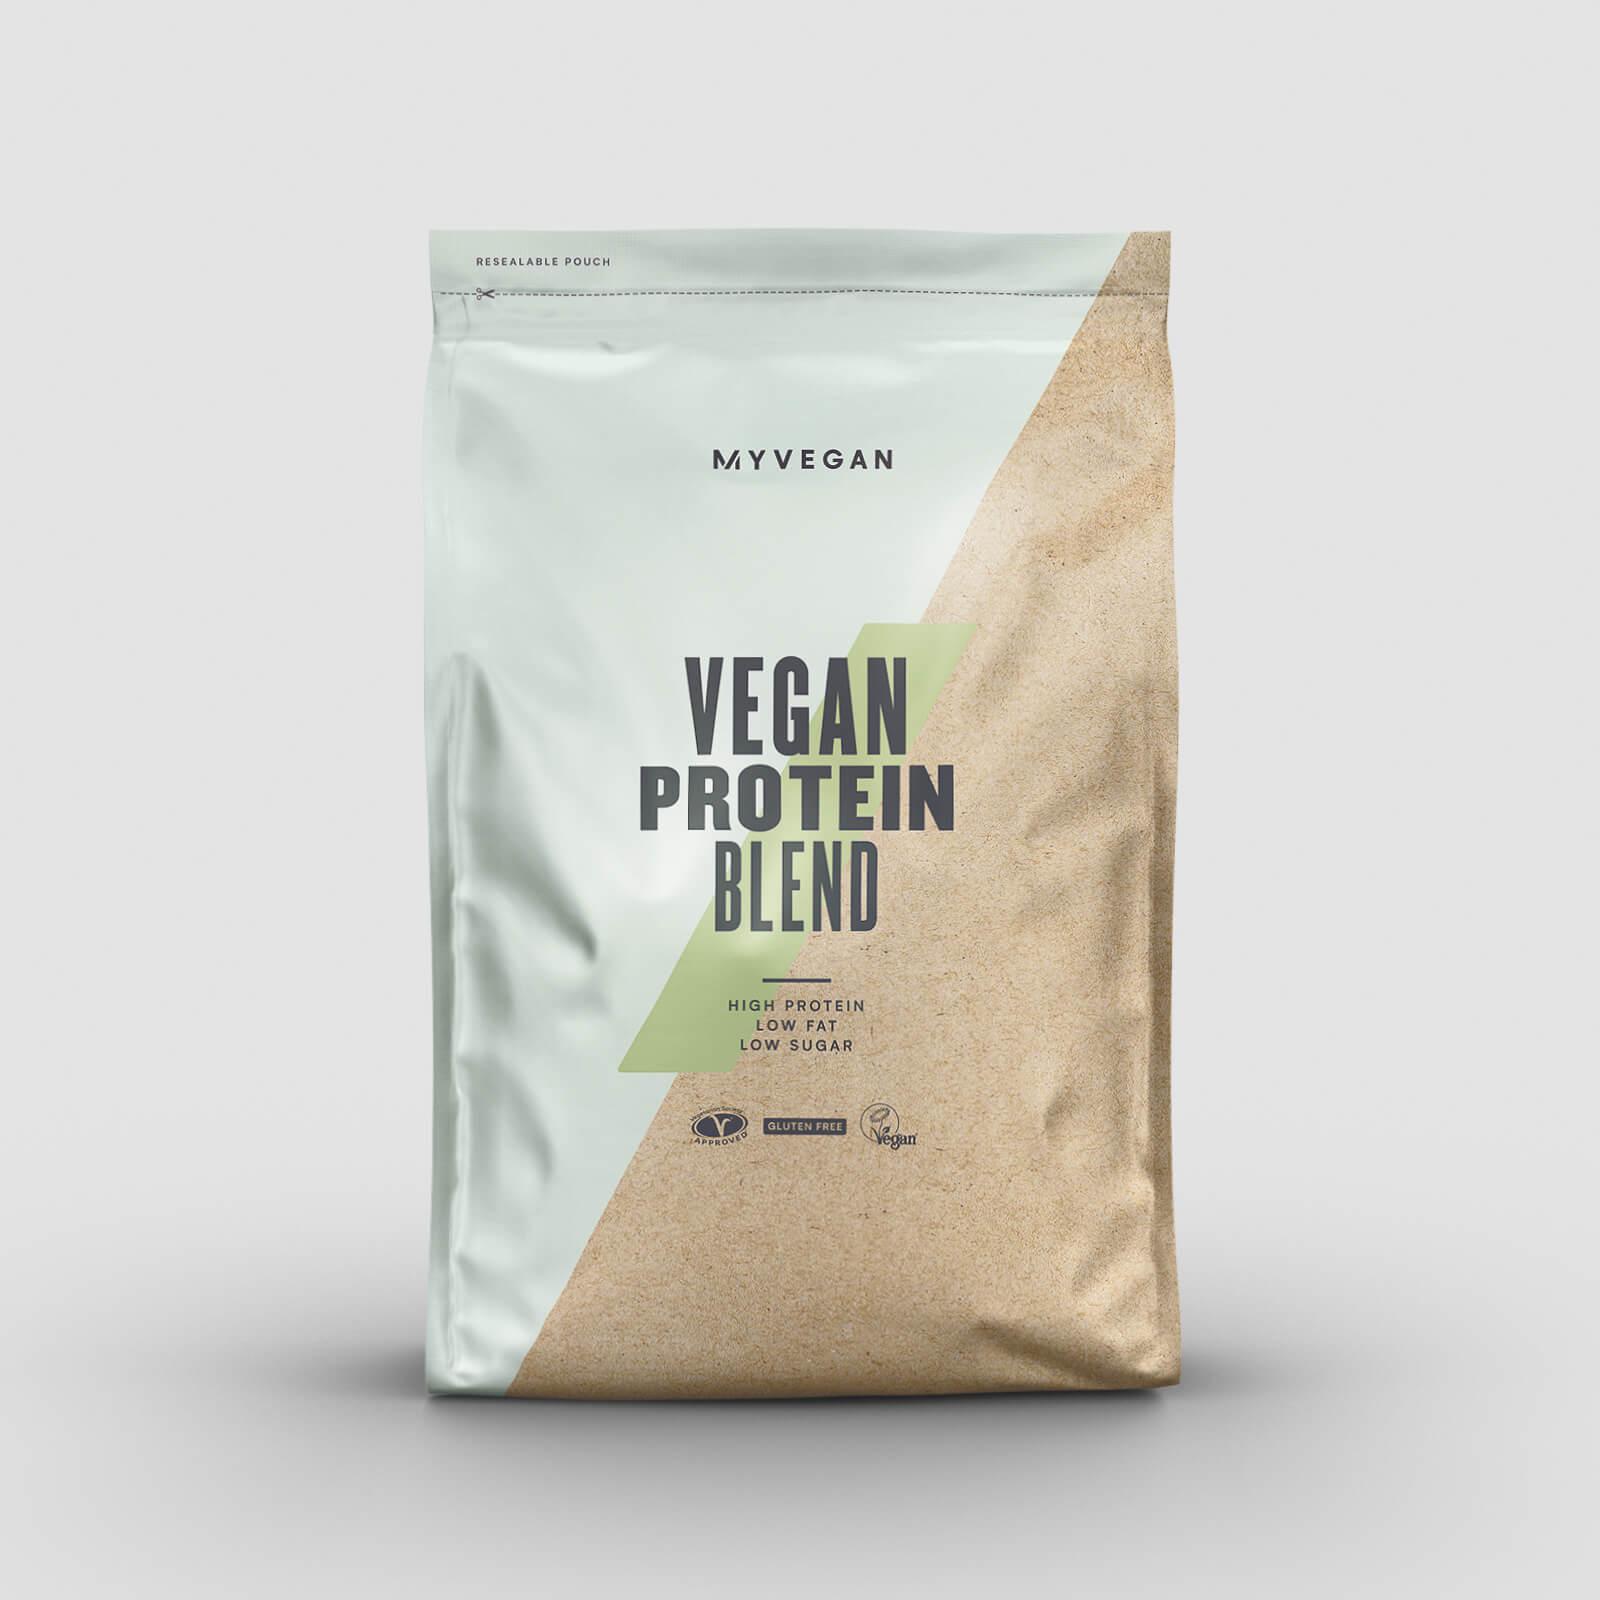 Myvegan Mélange de protéines végétales - 1kg - Coffee & Walnut